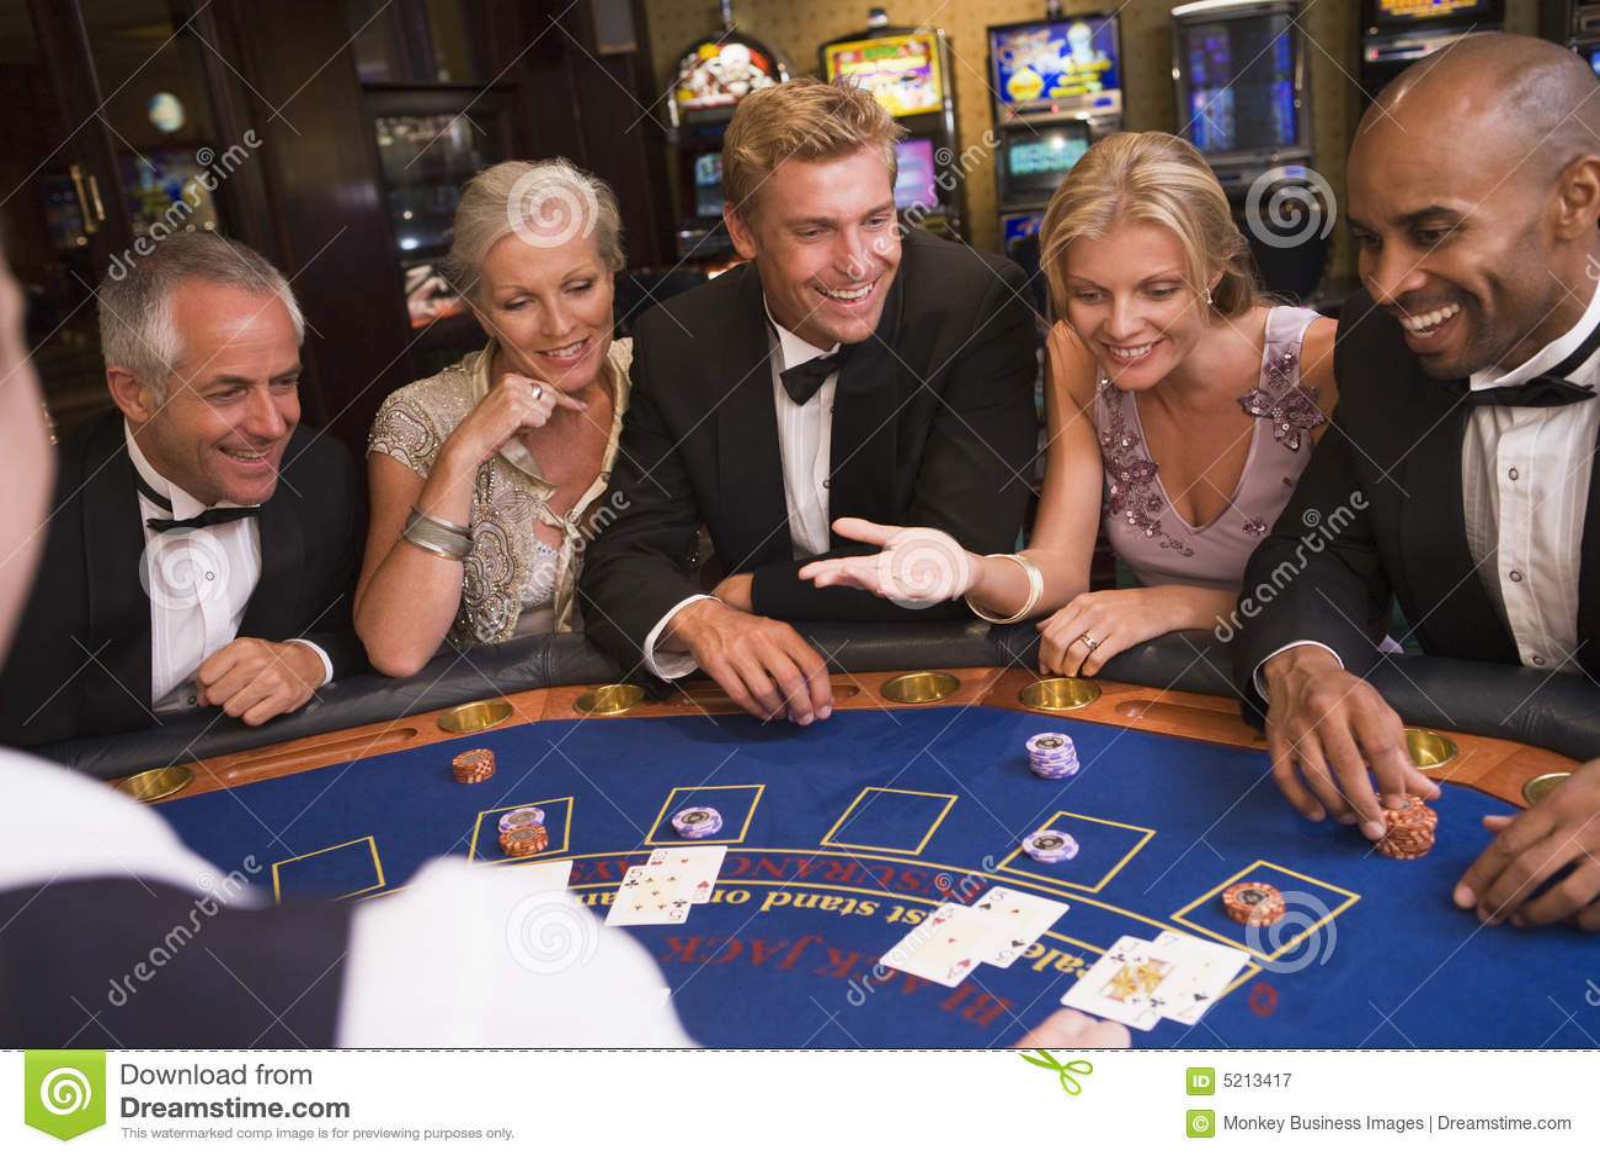 poker holland casino